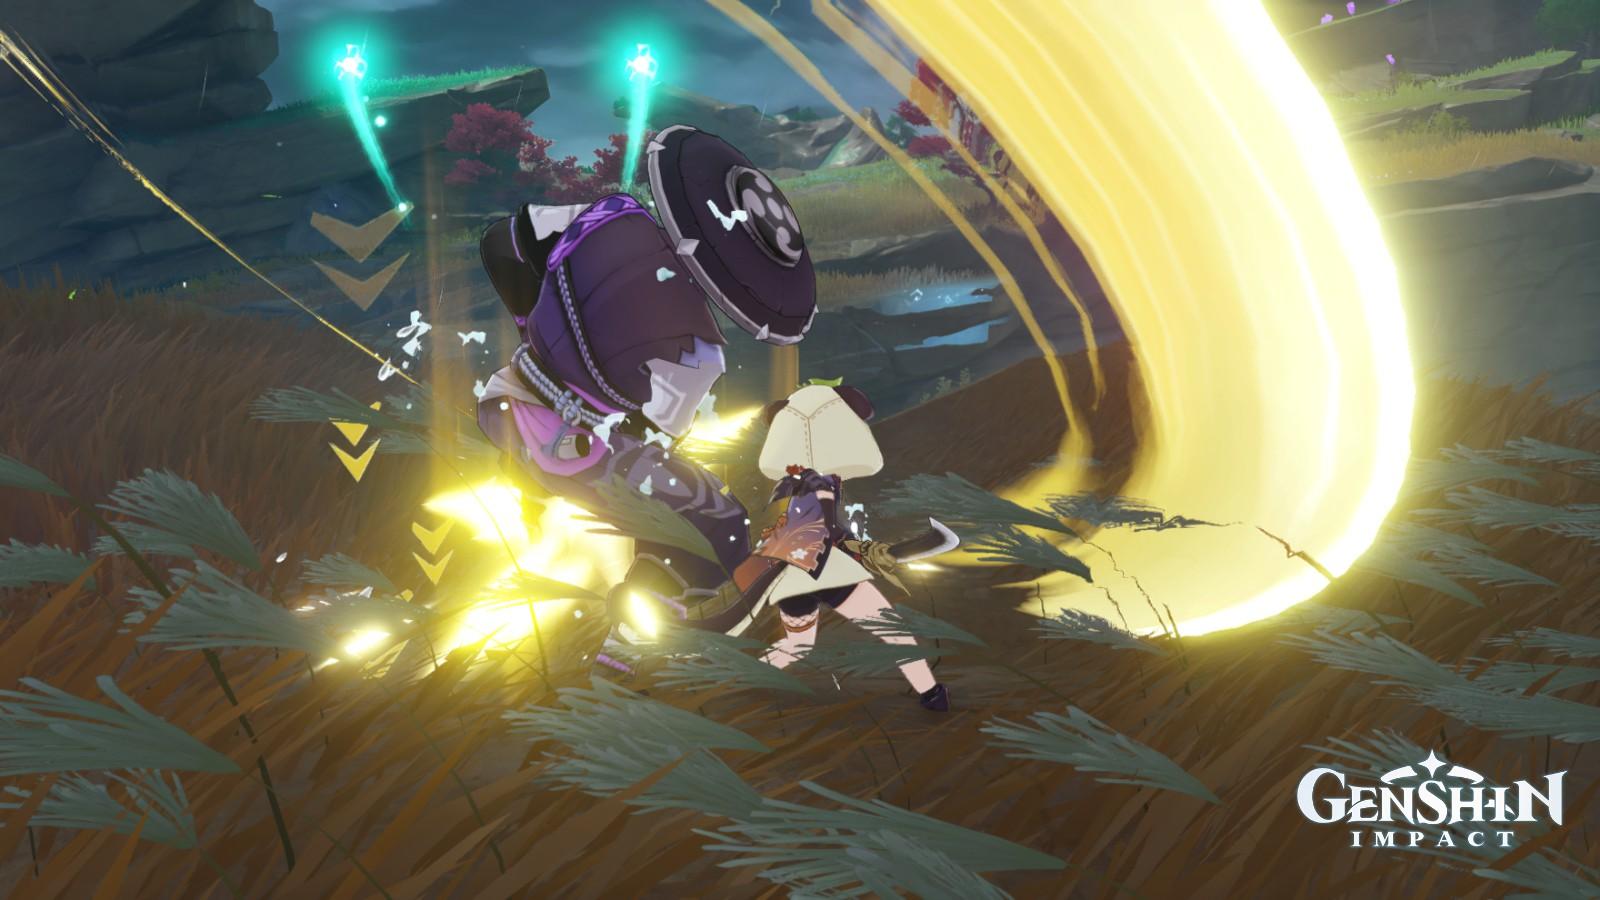 Genshin Impact - Sayu Normal ATK 01